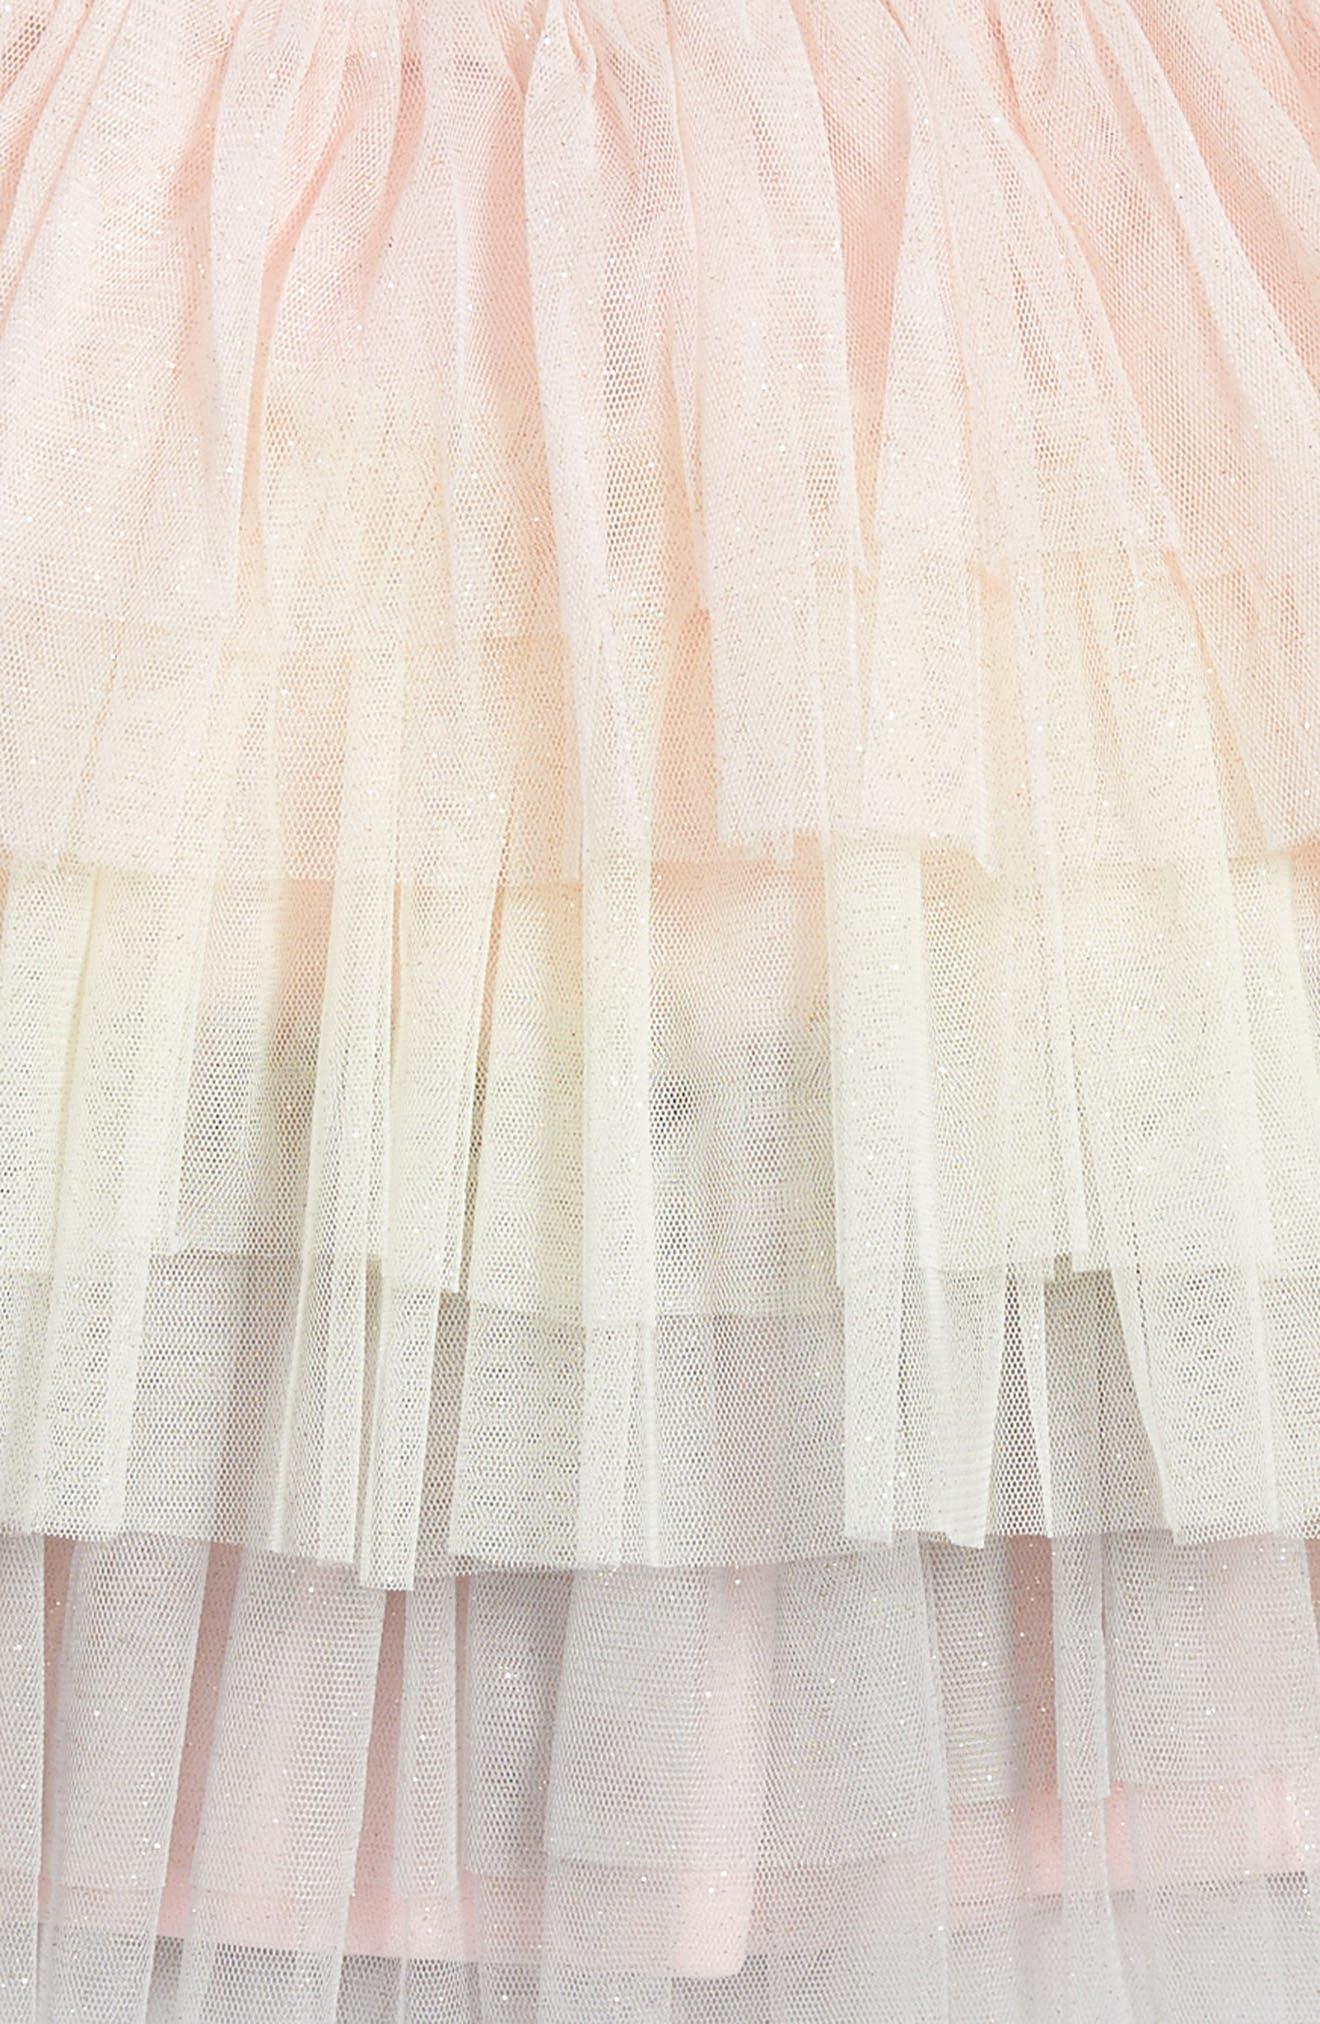 Tiered Tutu Skirt,                             Alternate thumbnail 3, color,                             Pink Multi